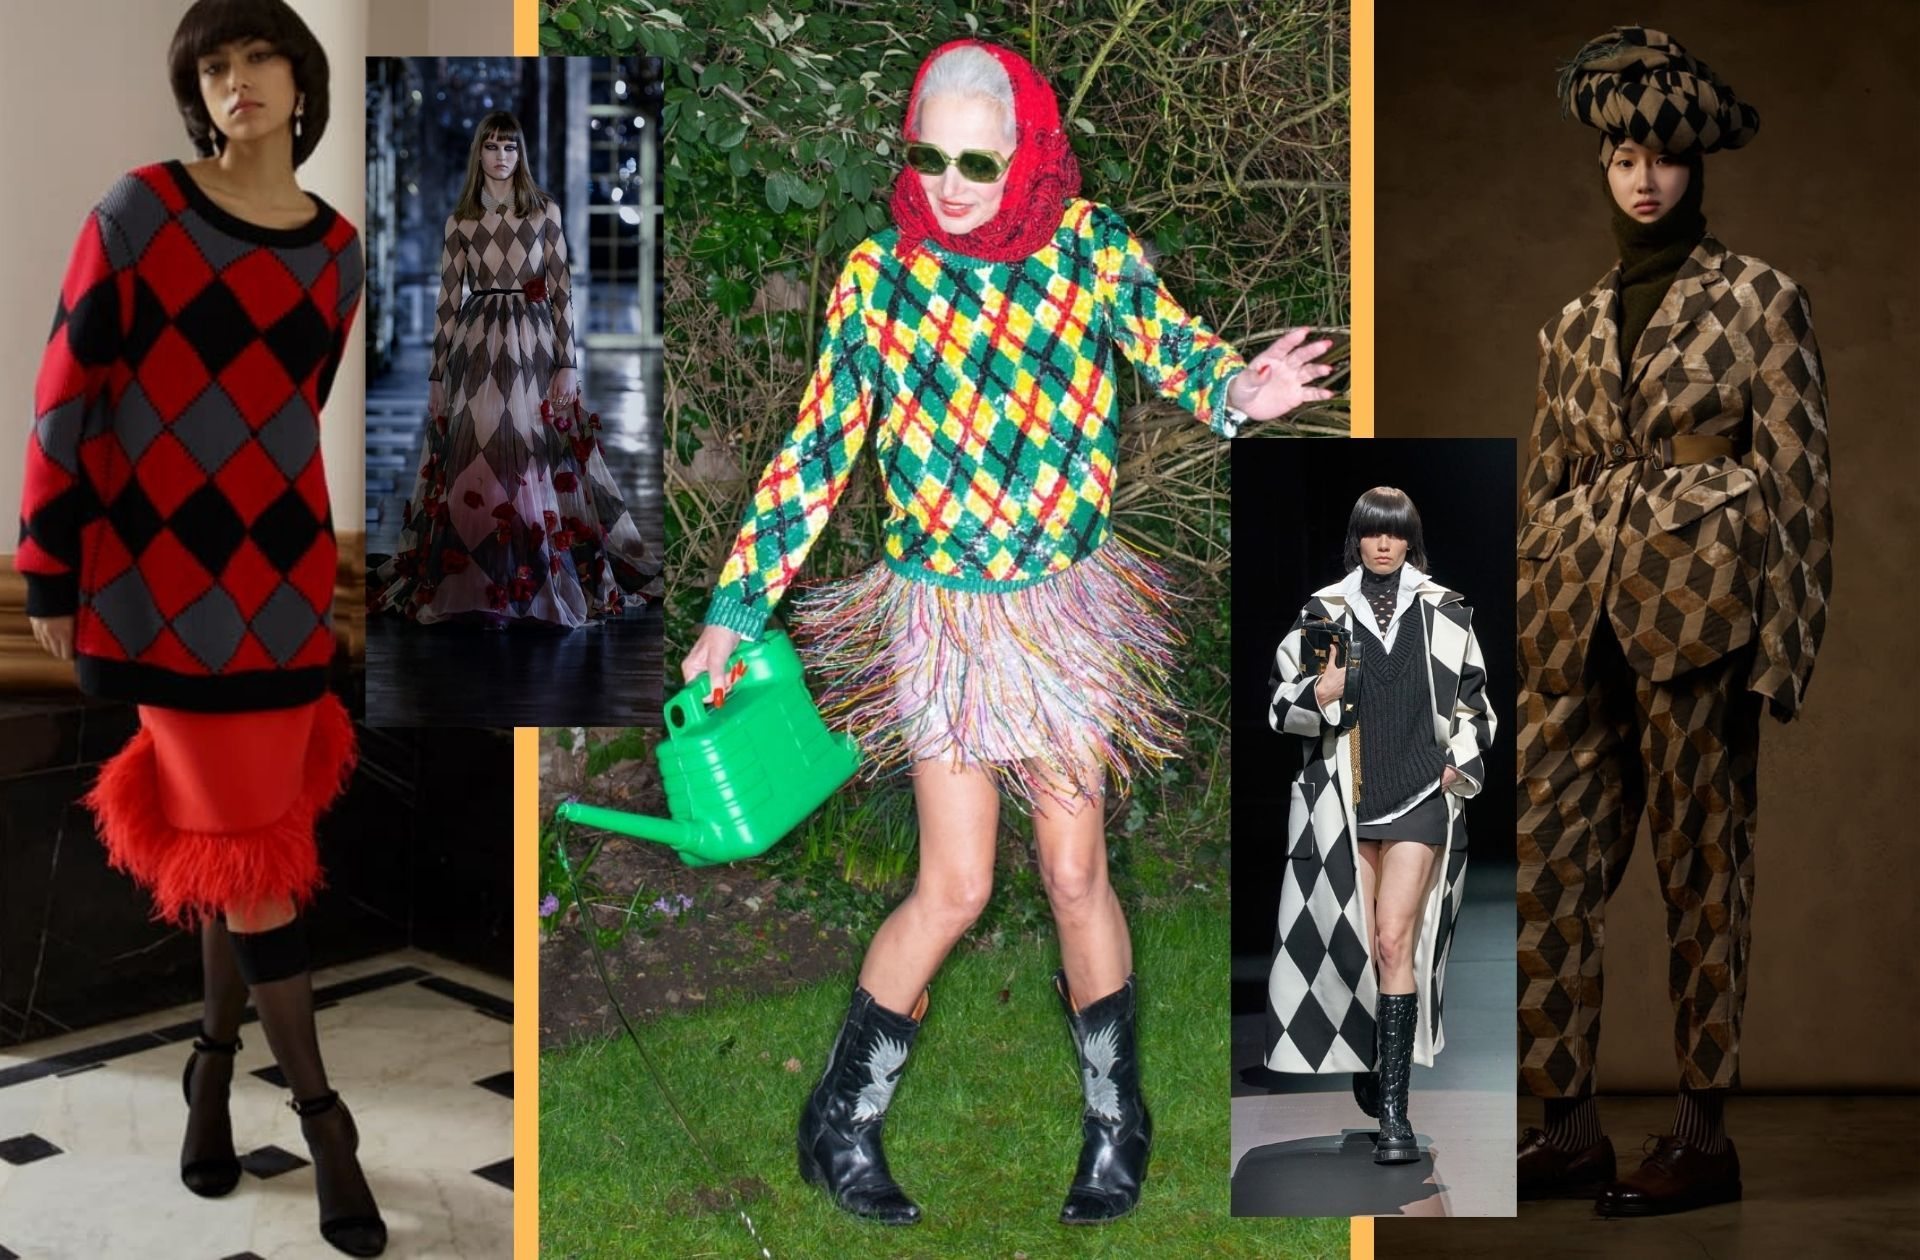 Les losanges et damiers aperçus chez Huishan Zhang, Christian Dior, Ashish, Valentino, ou encore Uma Wang.